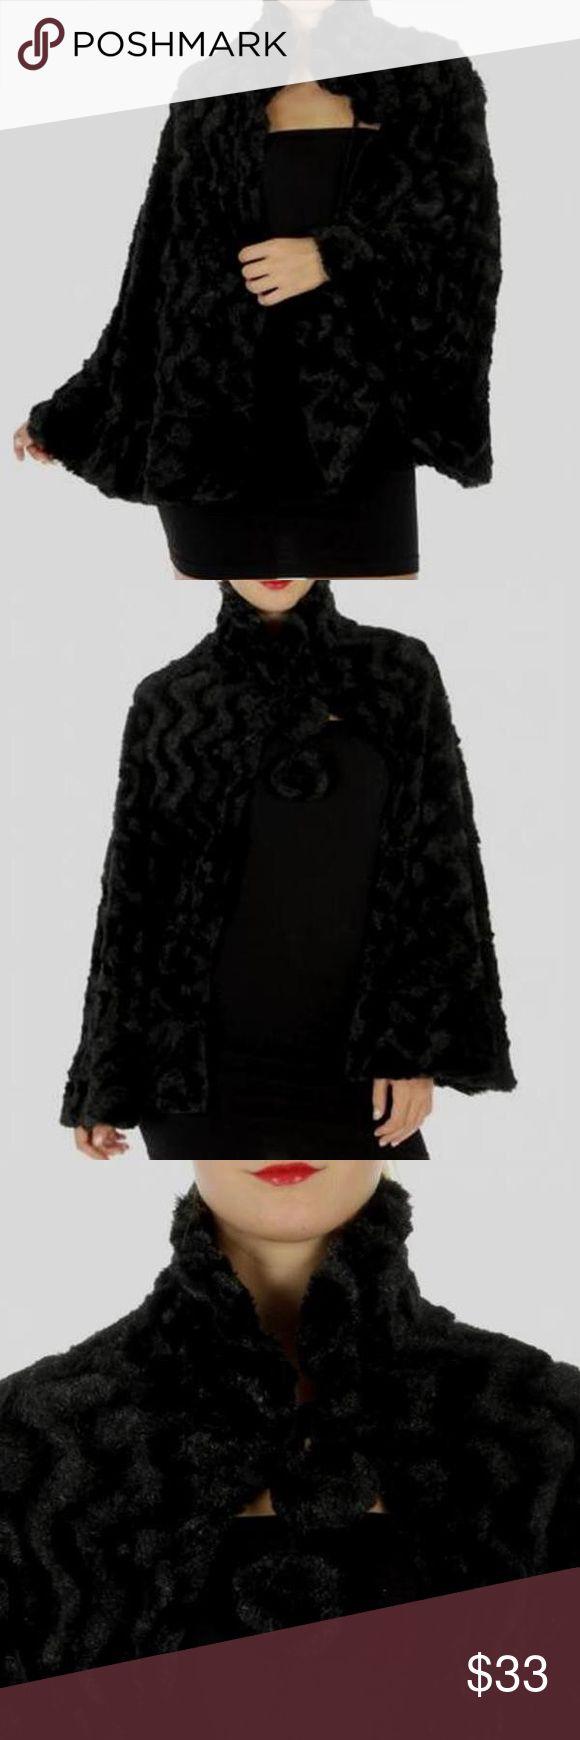 Faux fur bolero wrap cape Black faux fur bolero wrap cape. Polyester. One size. Jackets & Coats Capes